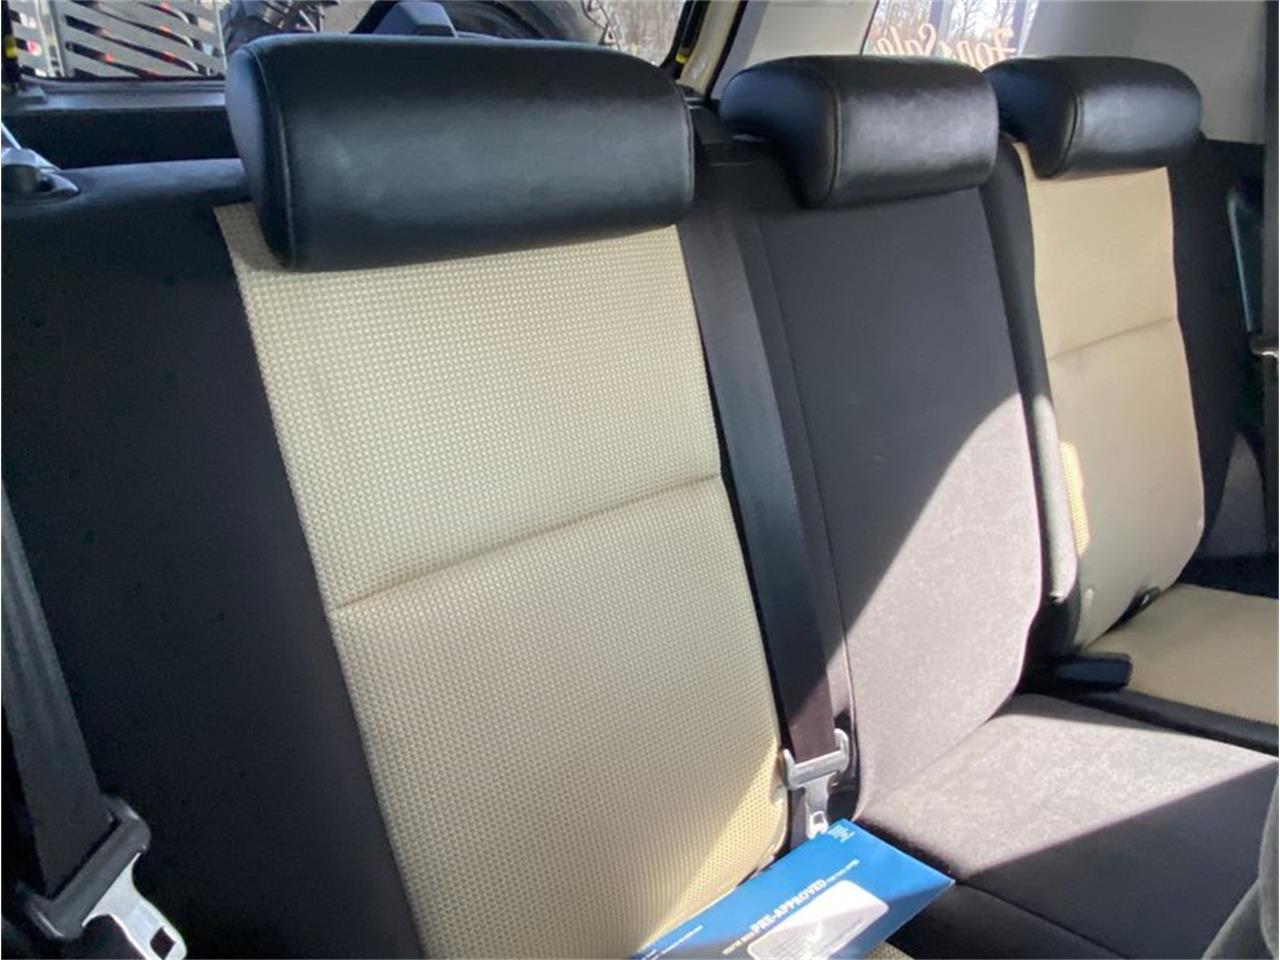 2010 Toyota FJ Cruiser (CC-1323174) for sale in West Babylon, New York